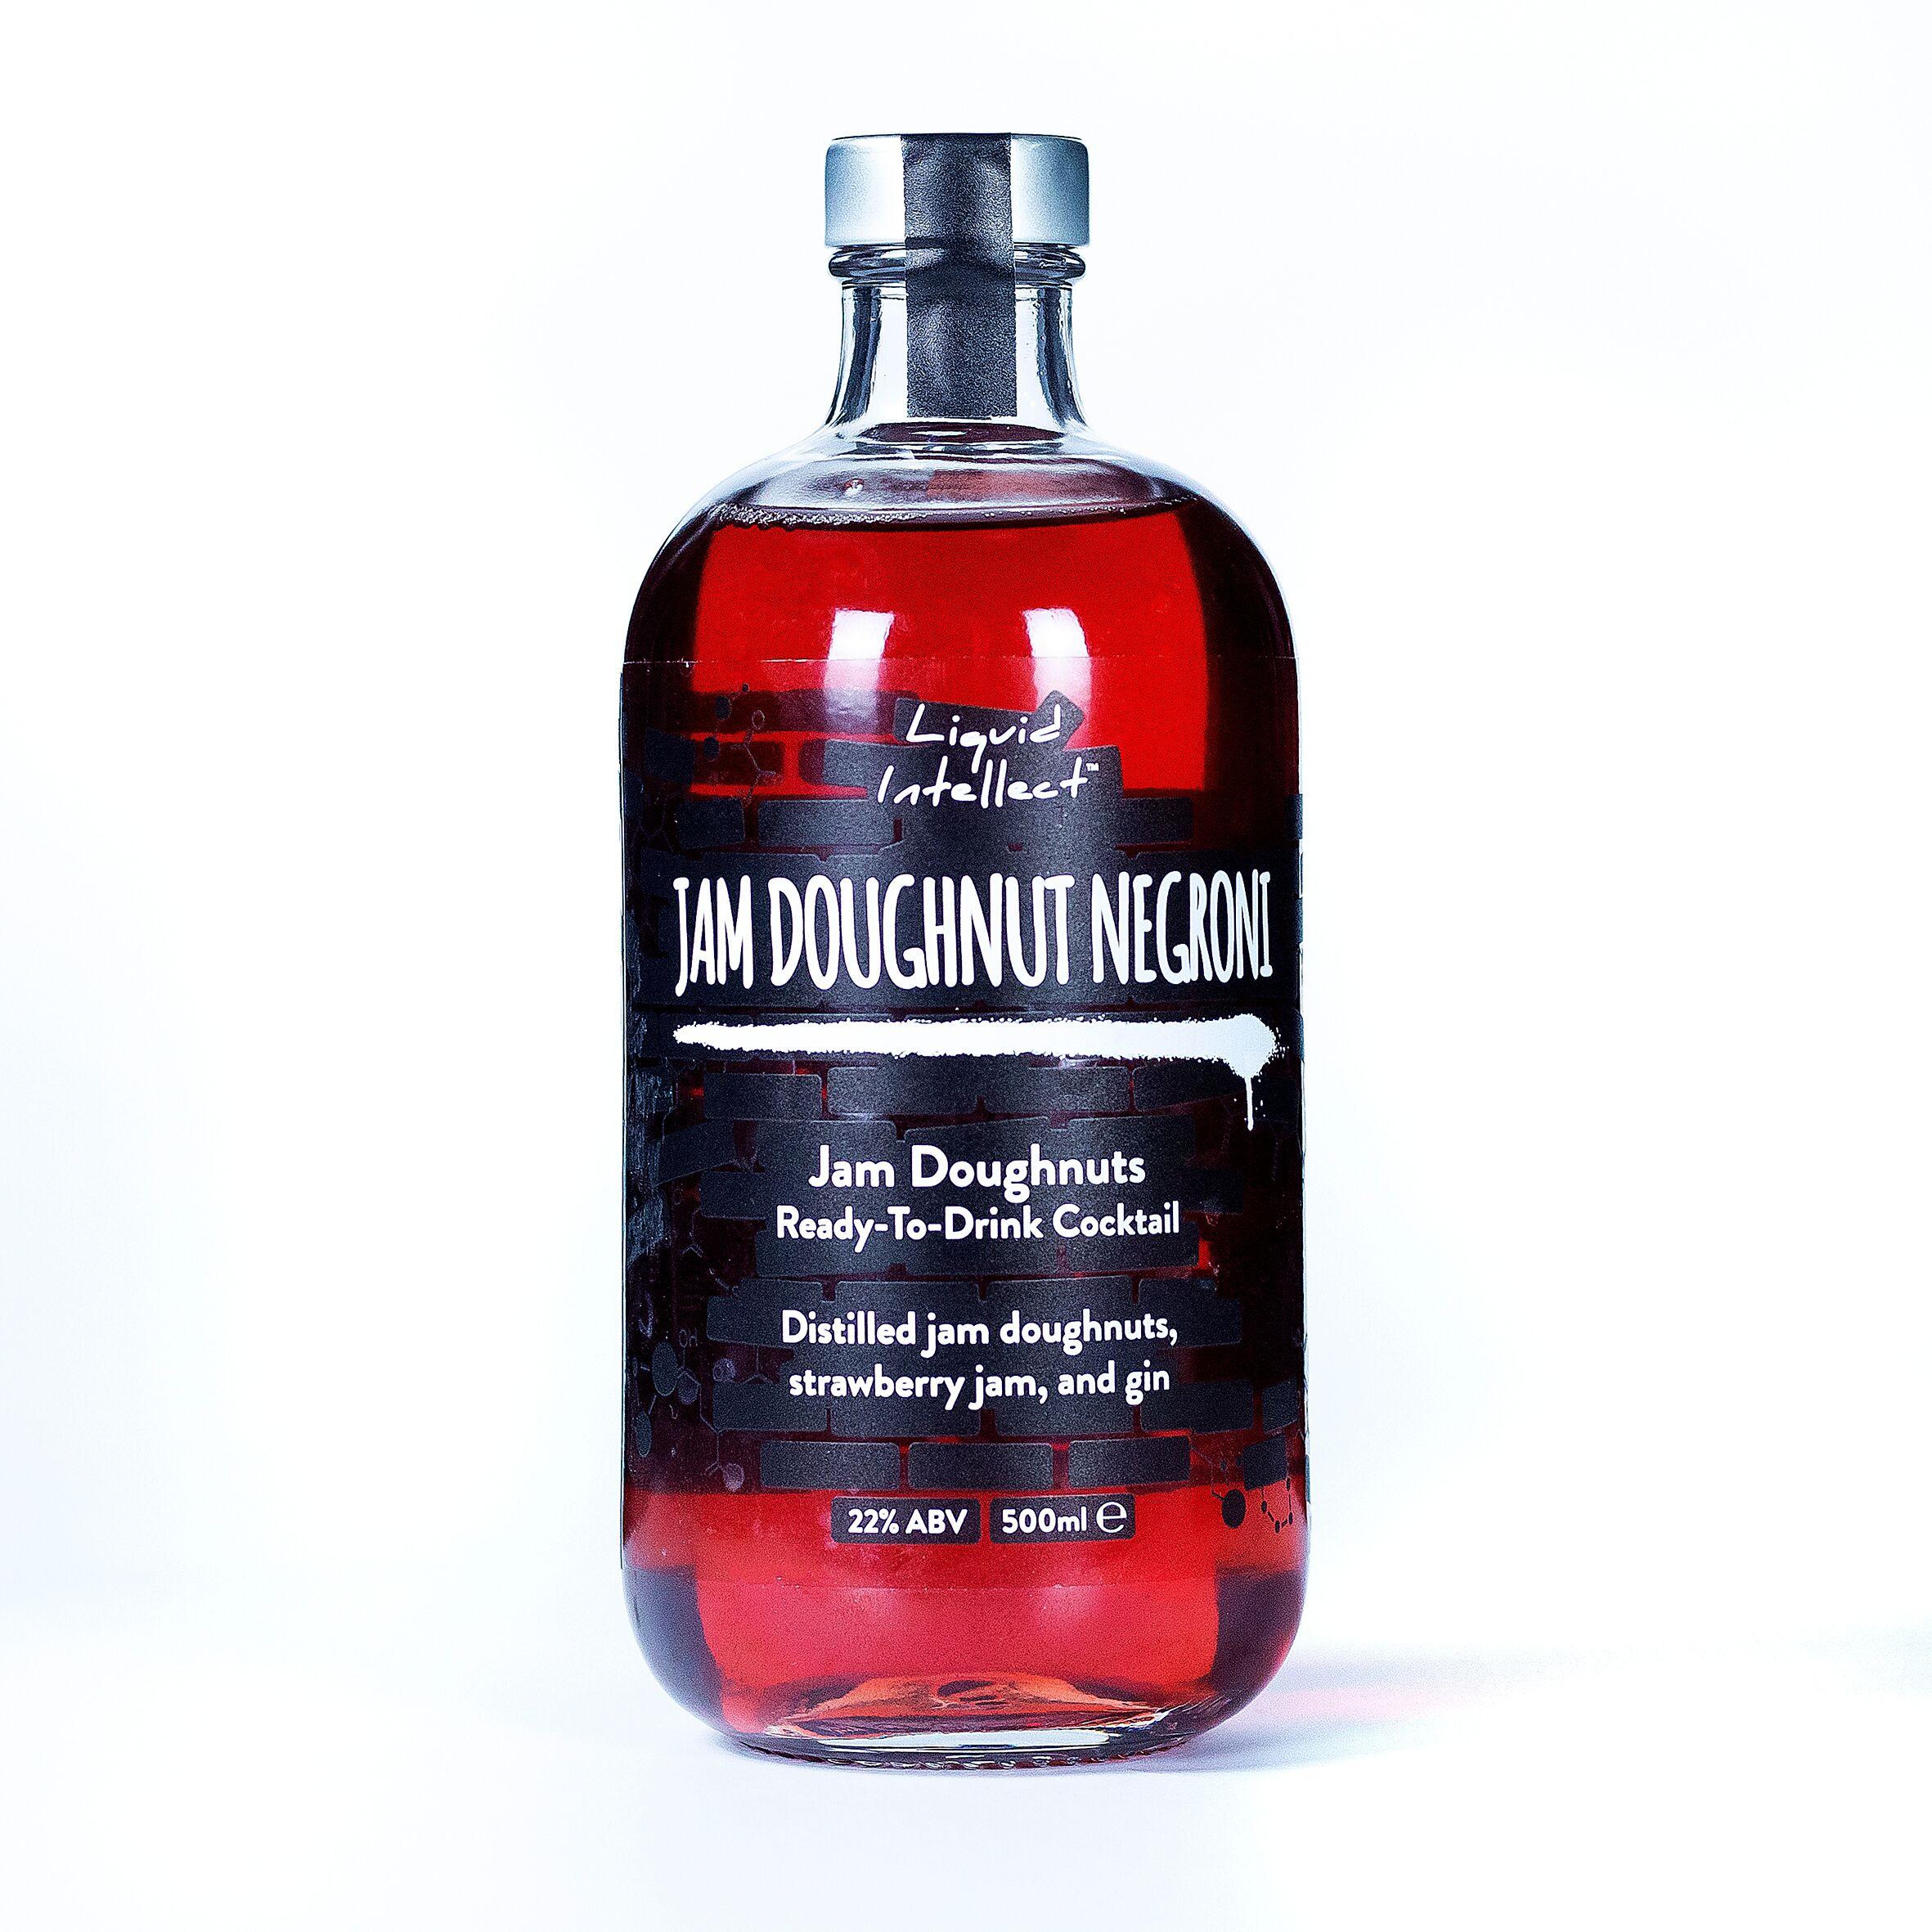 Jam Doughnut Negroni, part of the  Liquid Intellect bottle  range.